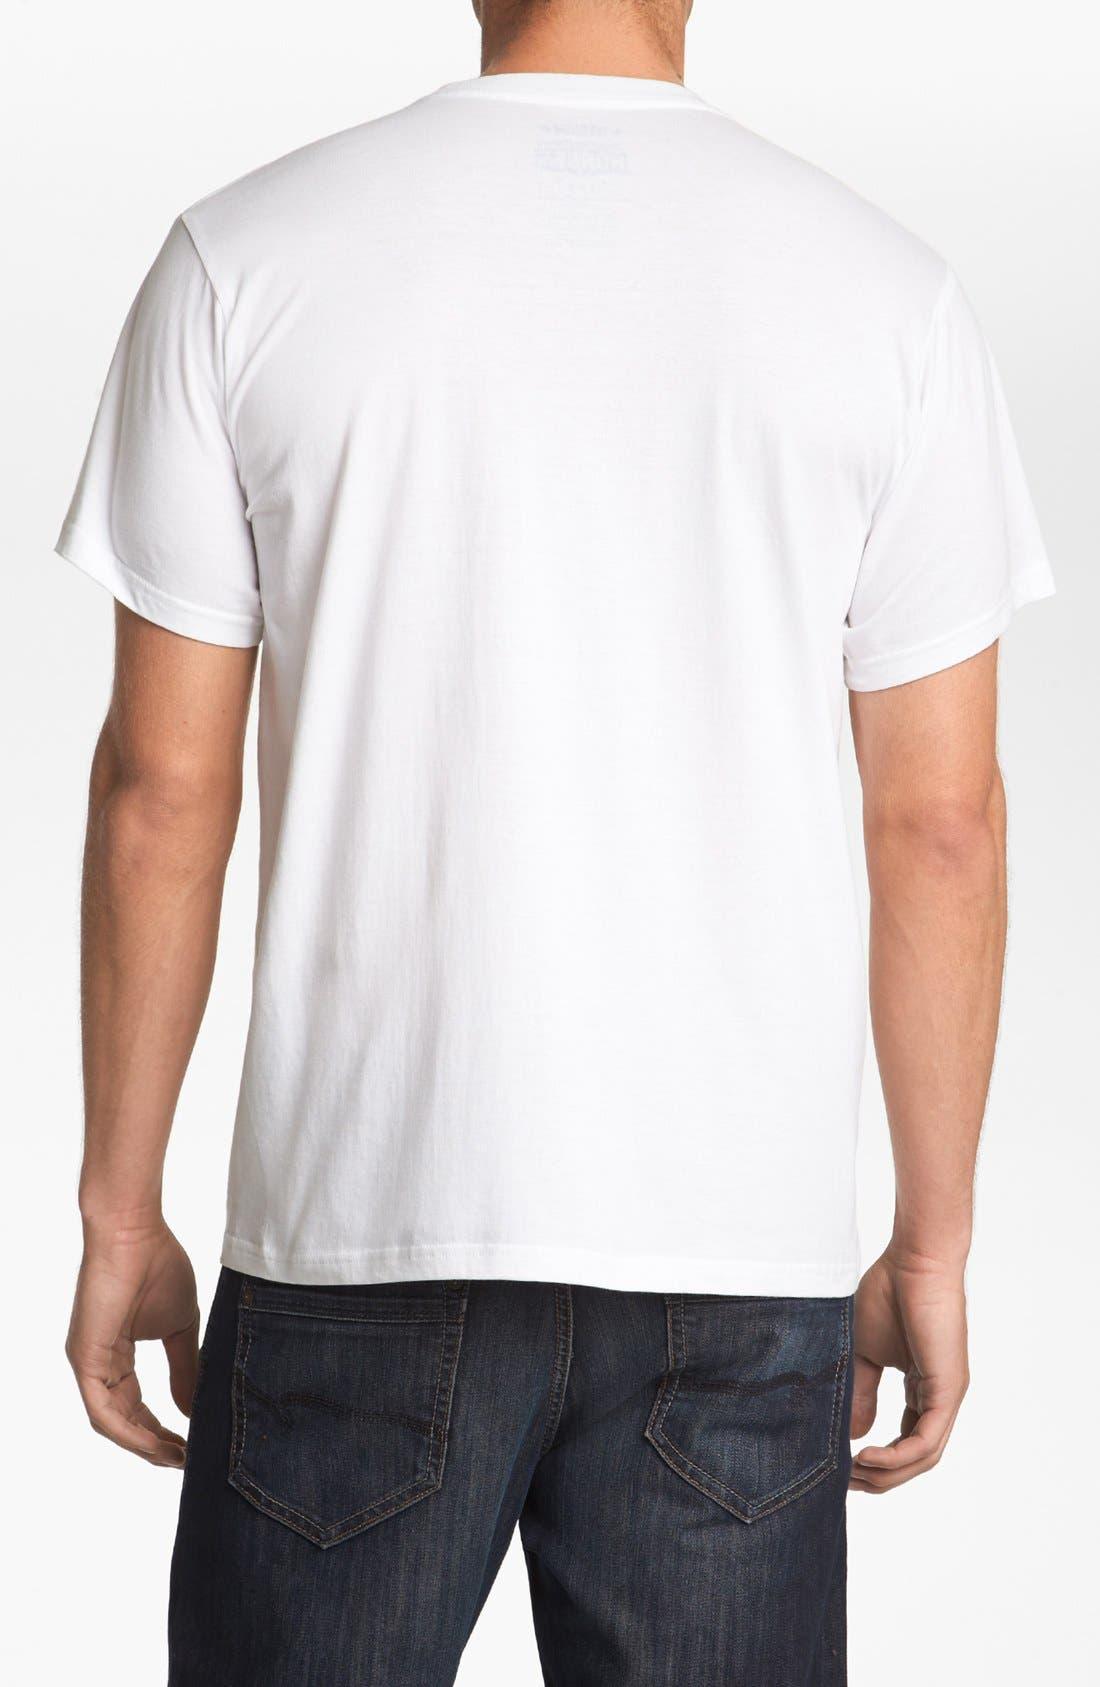 Alternate Image 2  - Horses Cut Shop 'Peter Paulsen's House of Wheels' T-Shirt